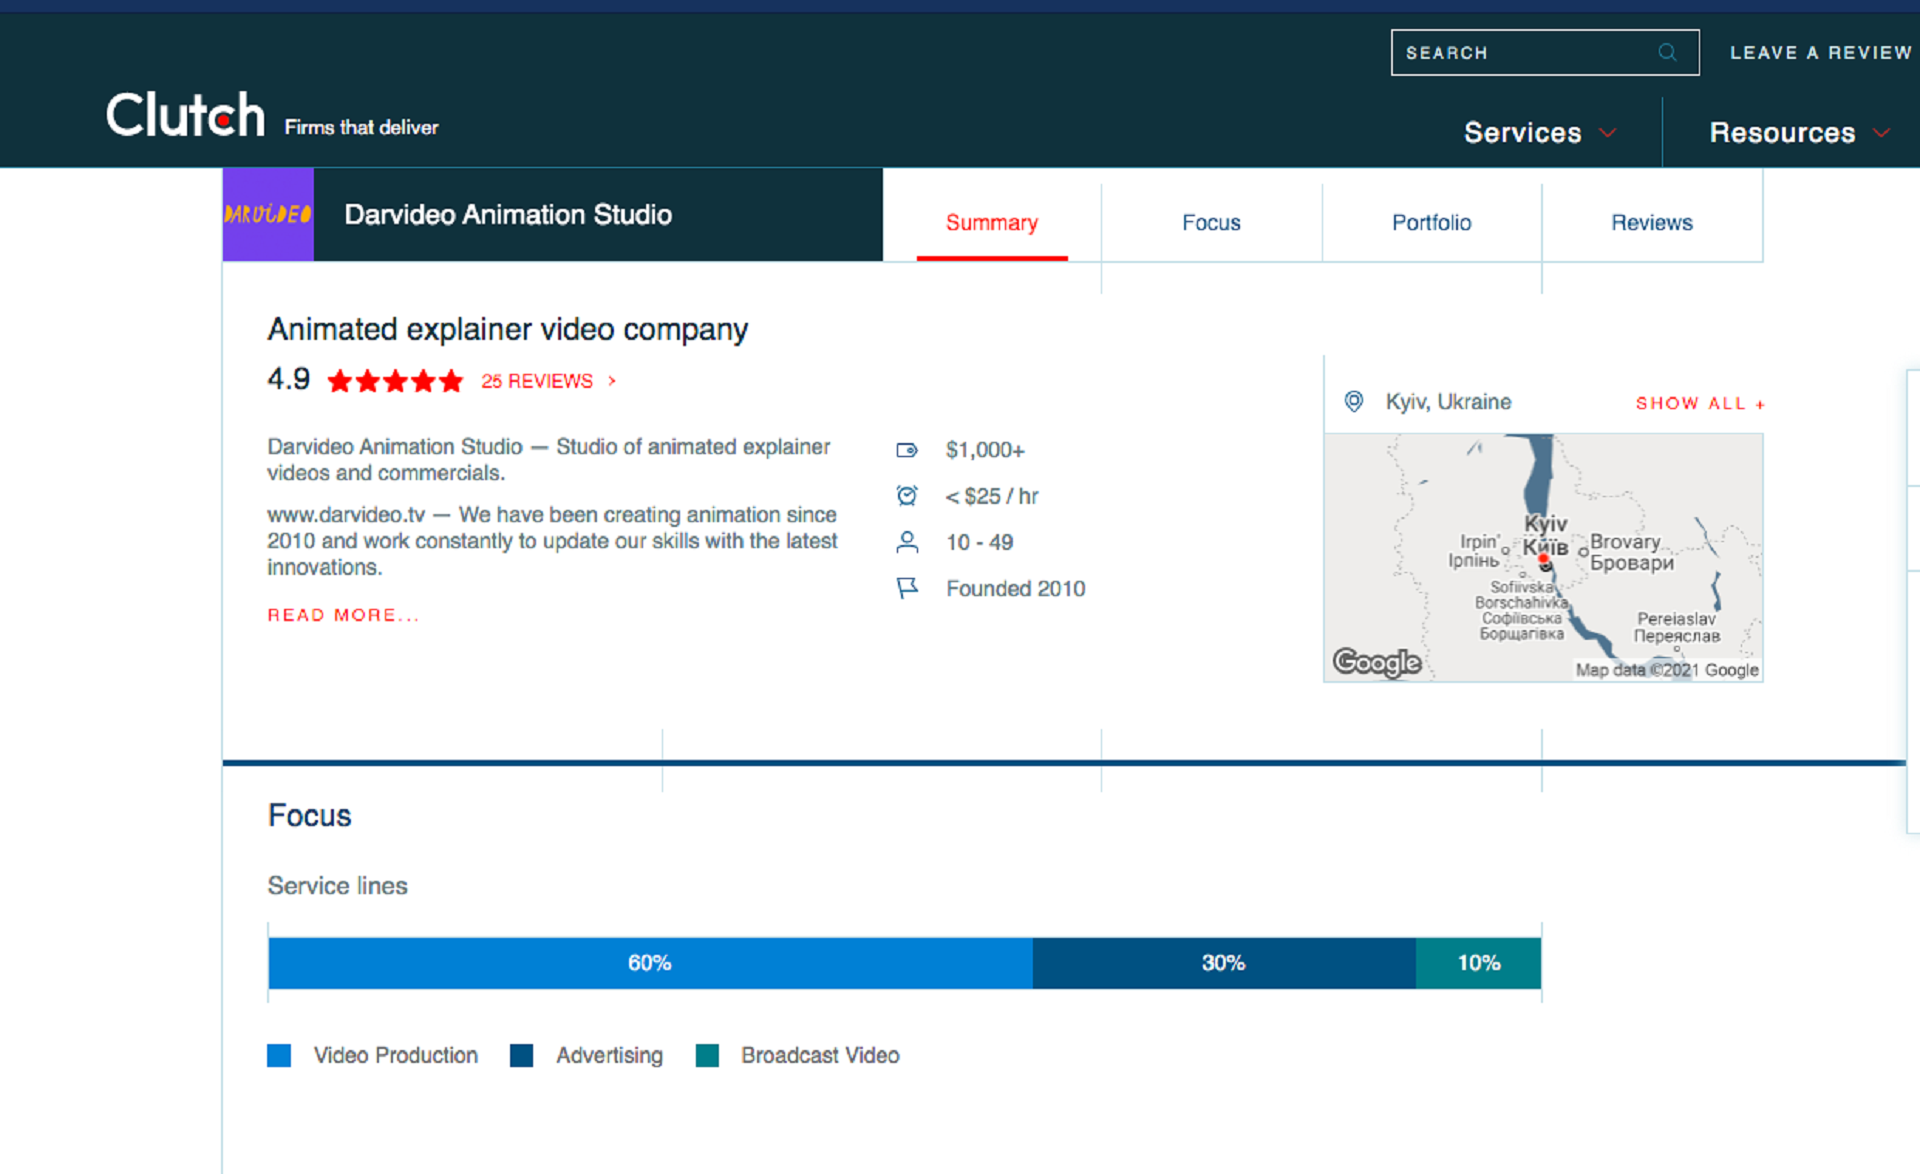 Clutch is a cool online platform